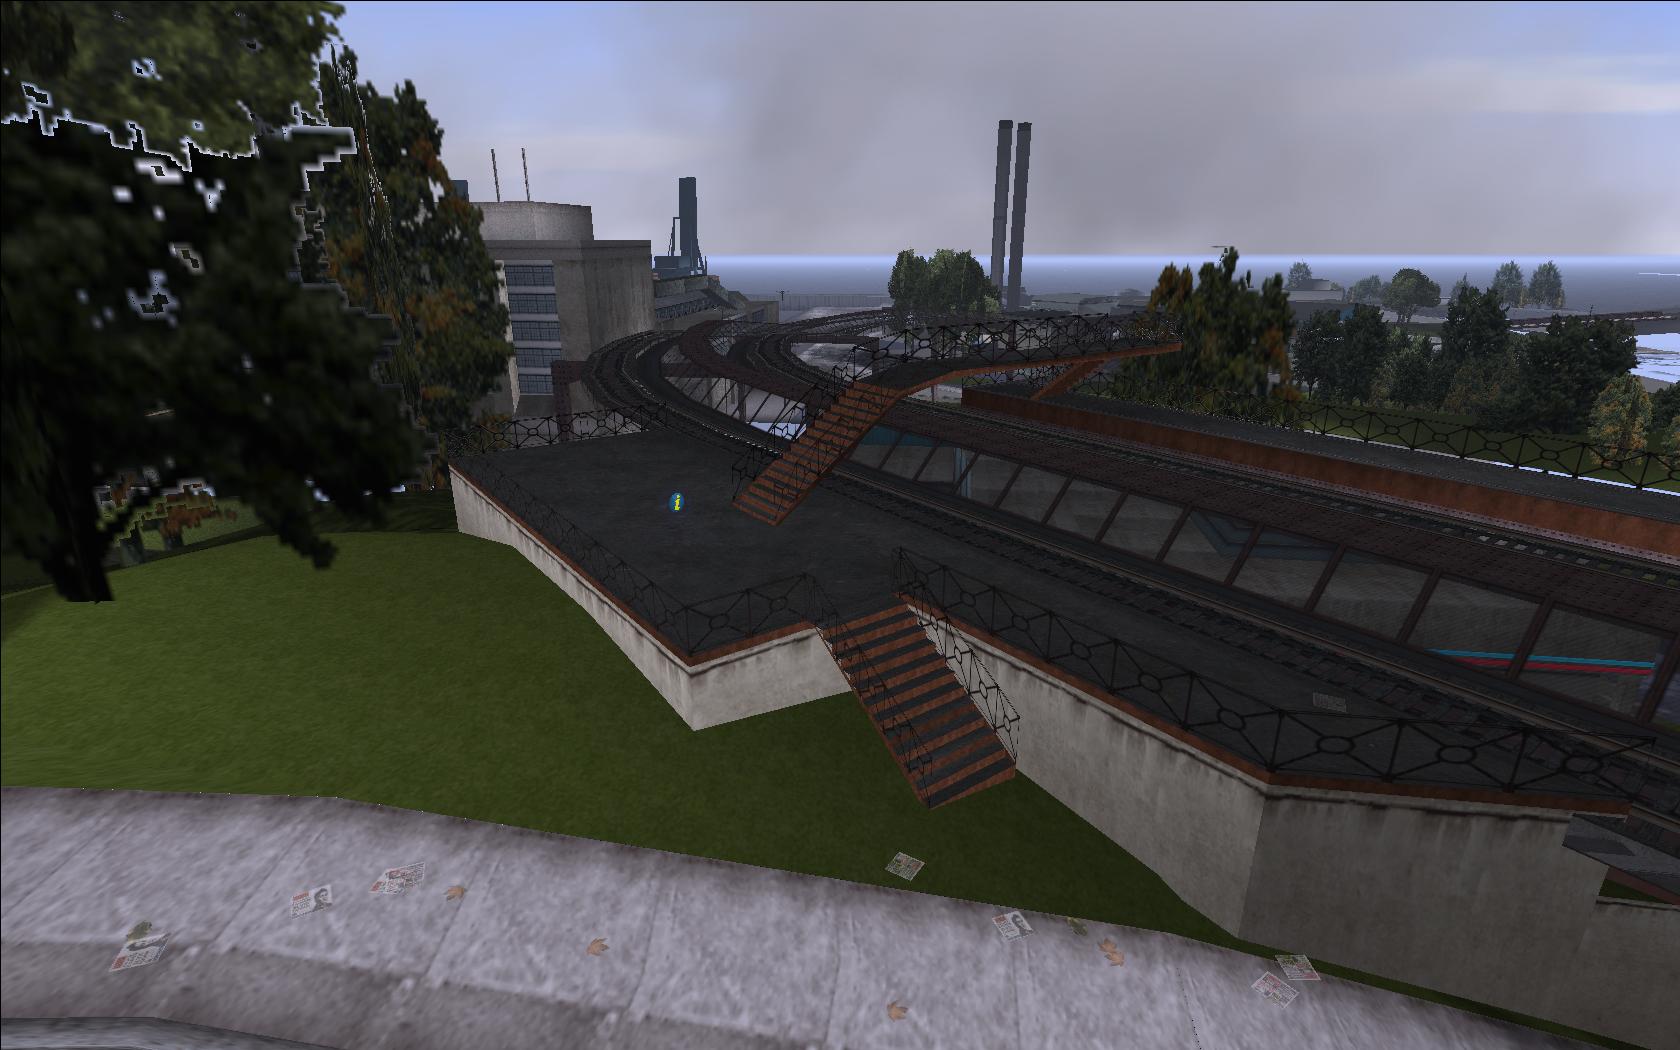 Baillie Station